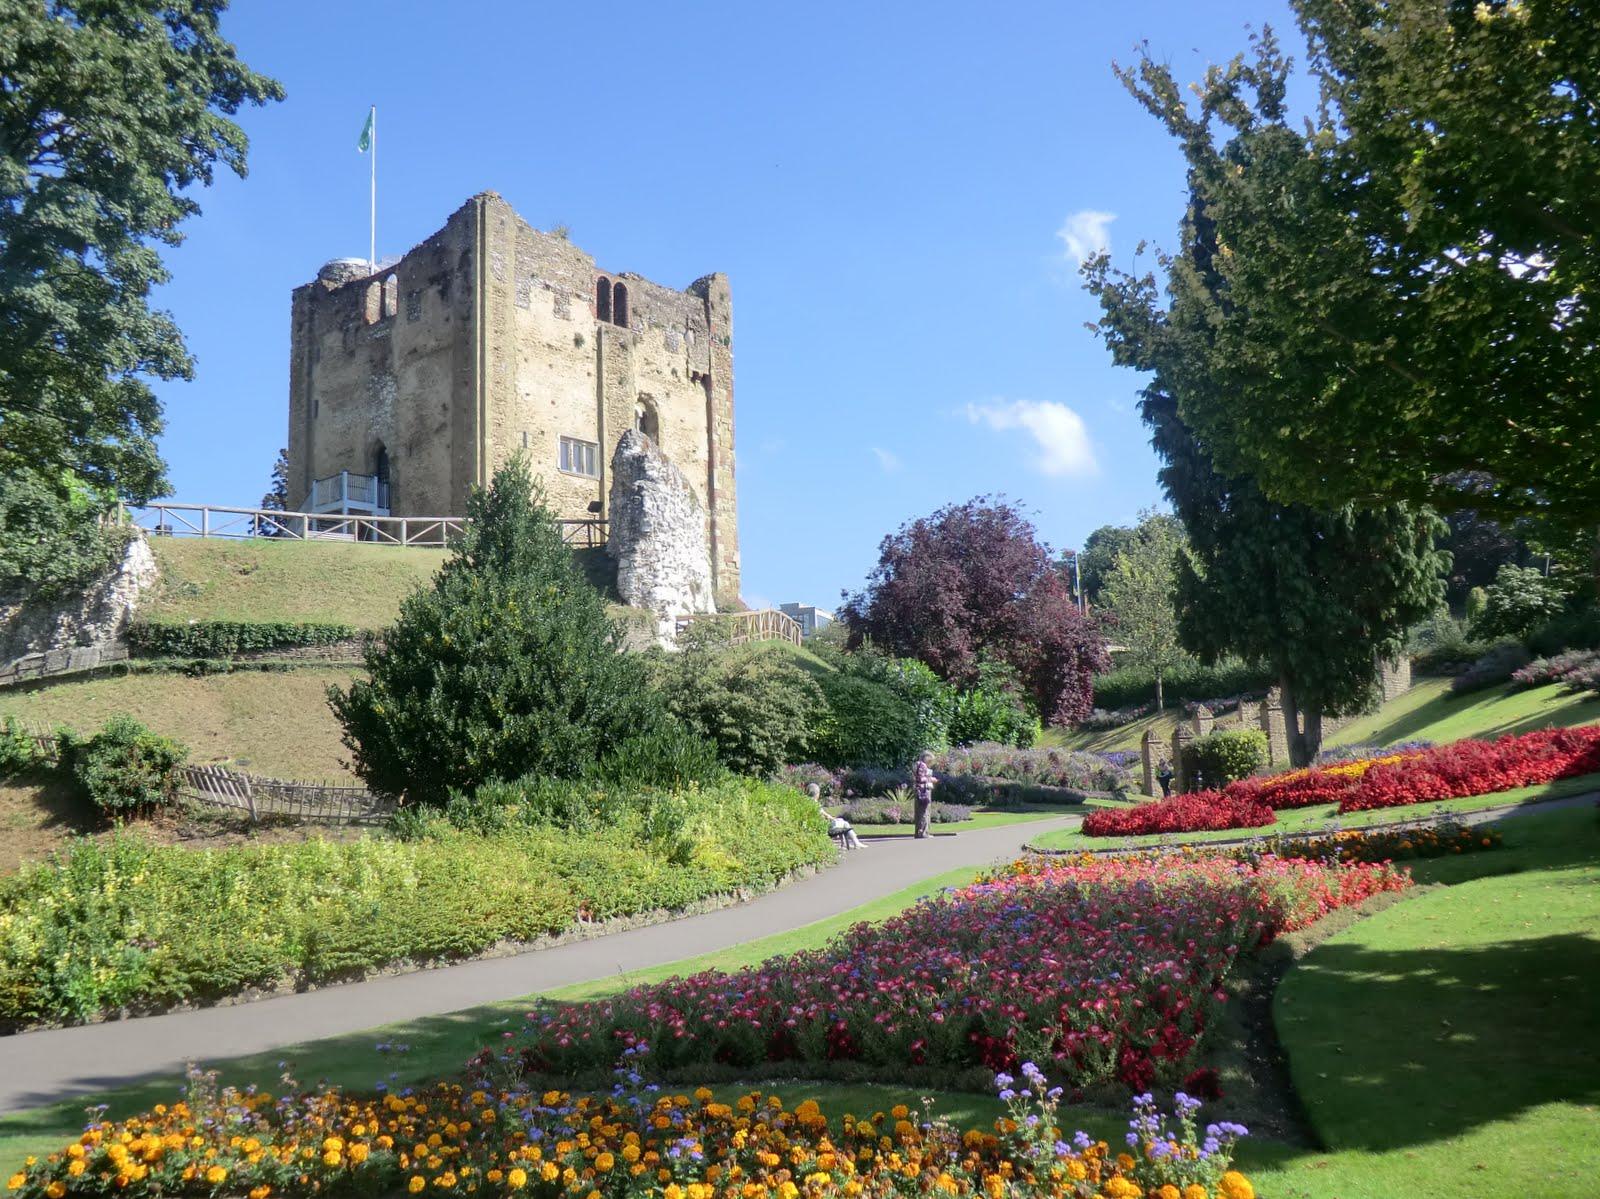 CIMG8481 Guildford Castle grounds